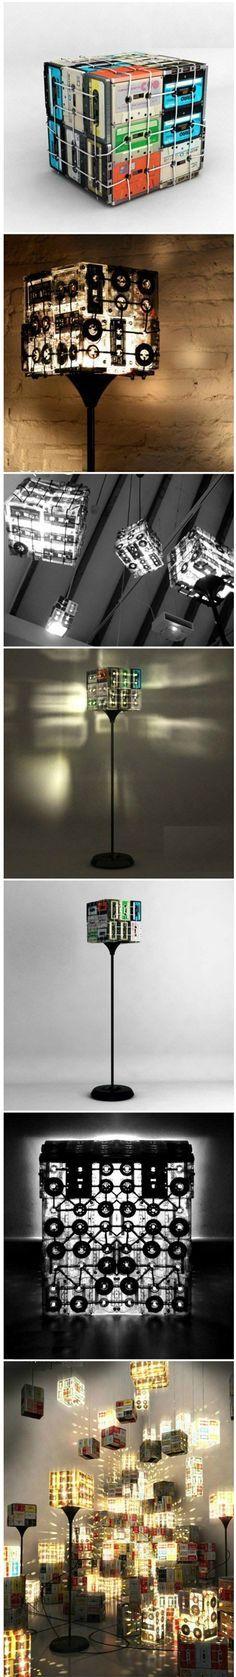 Great Tapes Lamp   DIY & Crafts Tutorials